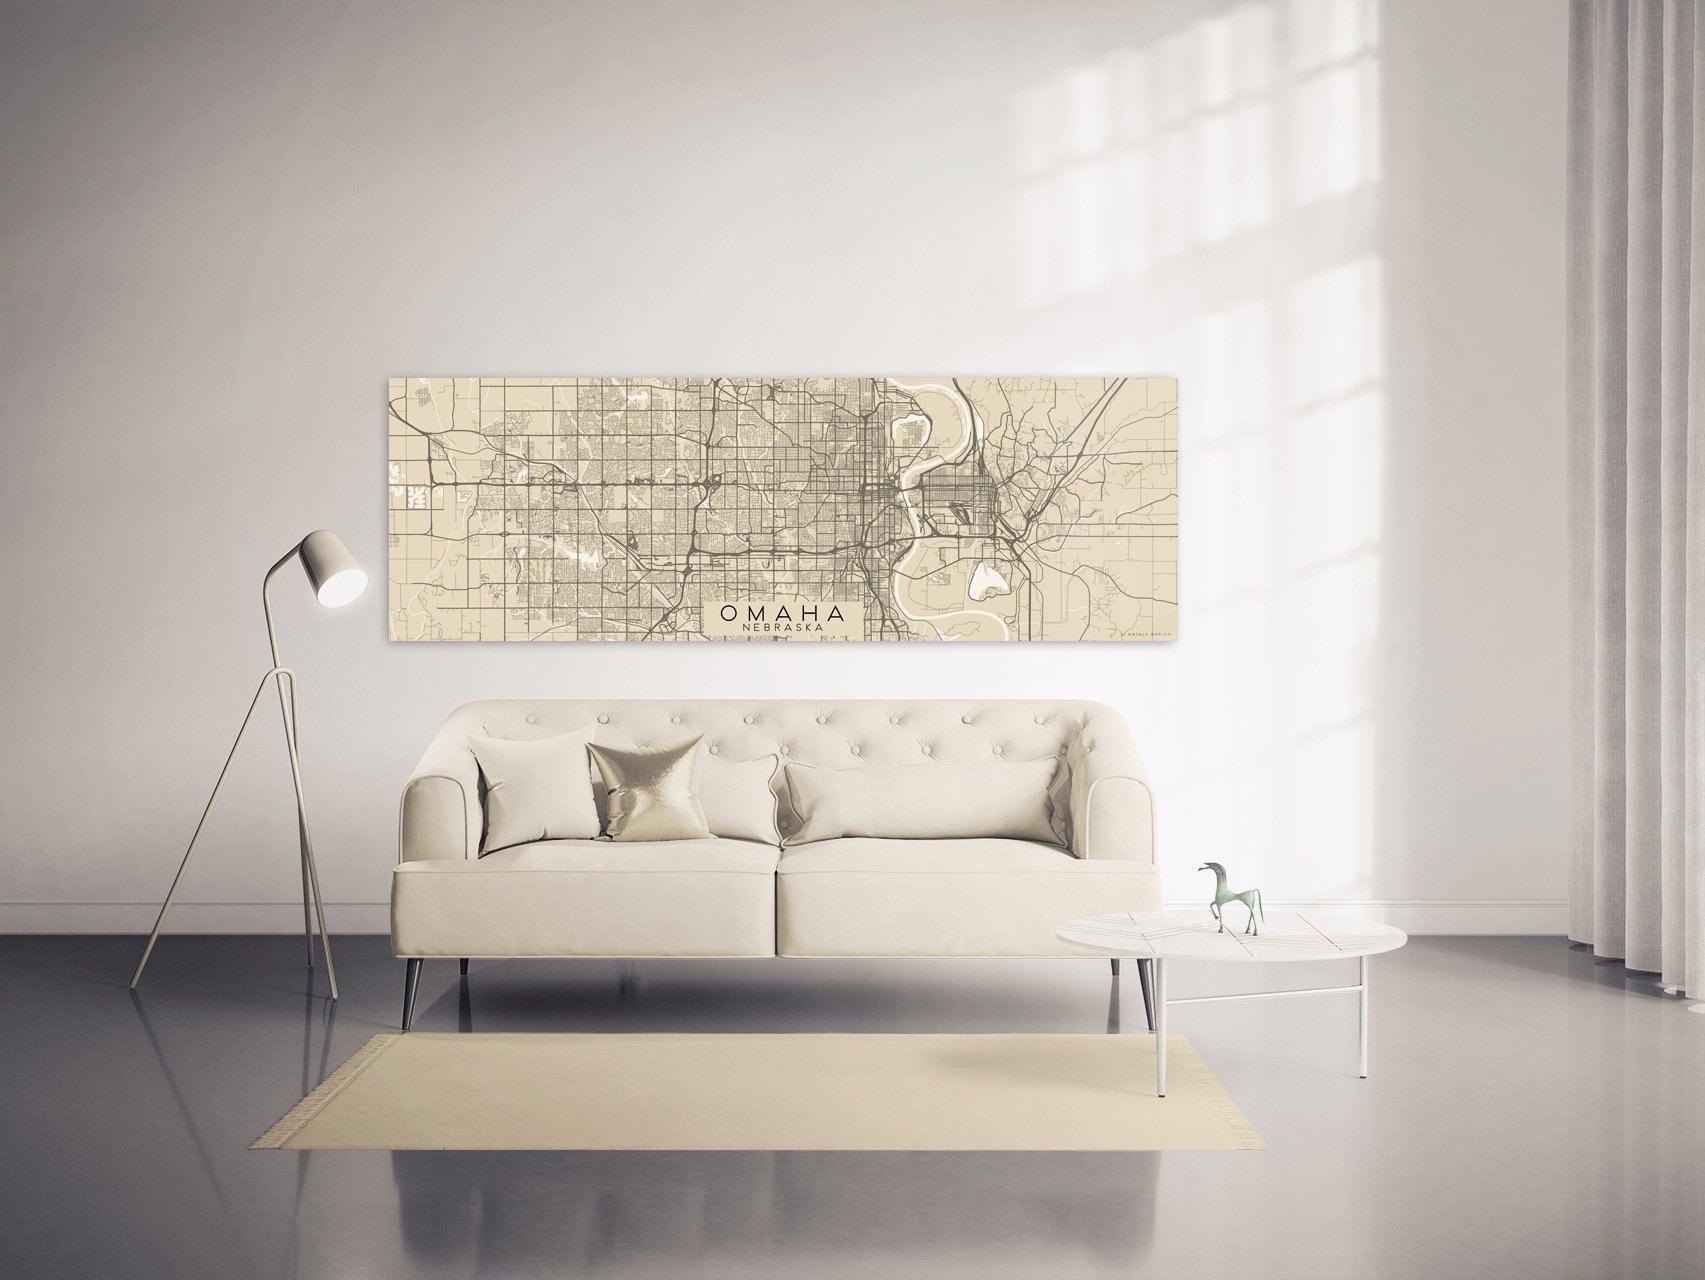 OMAHA NE Canvas Print Ready to Hang Nebraska City Map Large Oversized  Horizontal Wall Art Panoramic Simple Minimal Home Decor Gift for Home